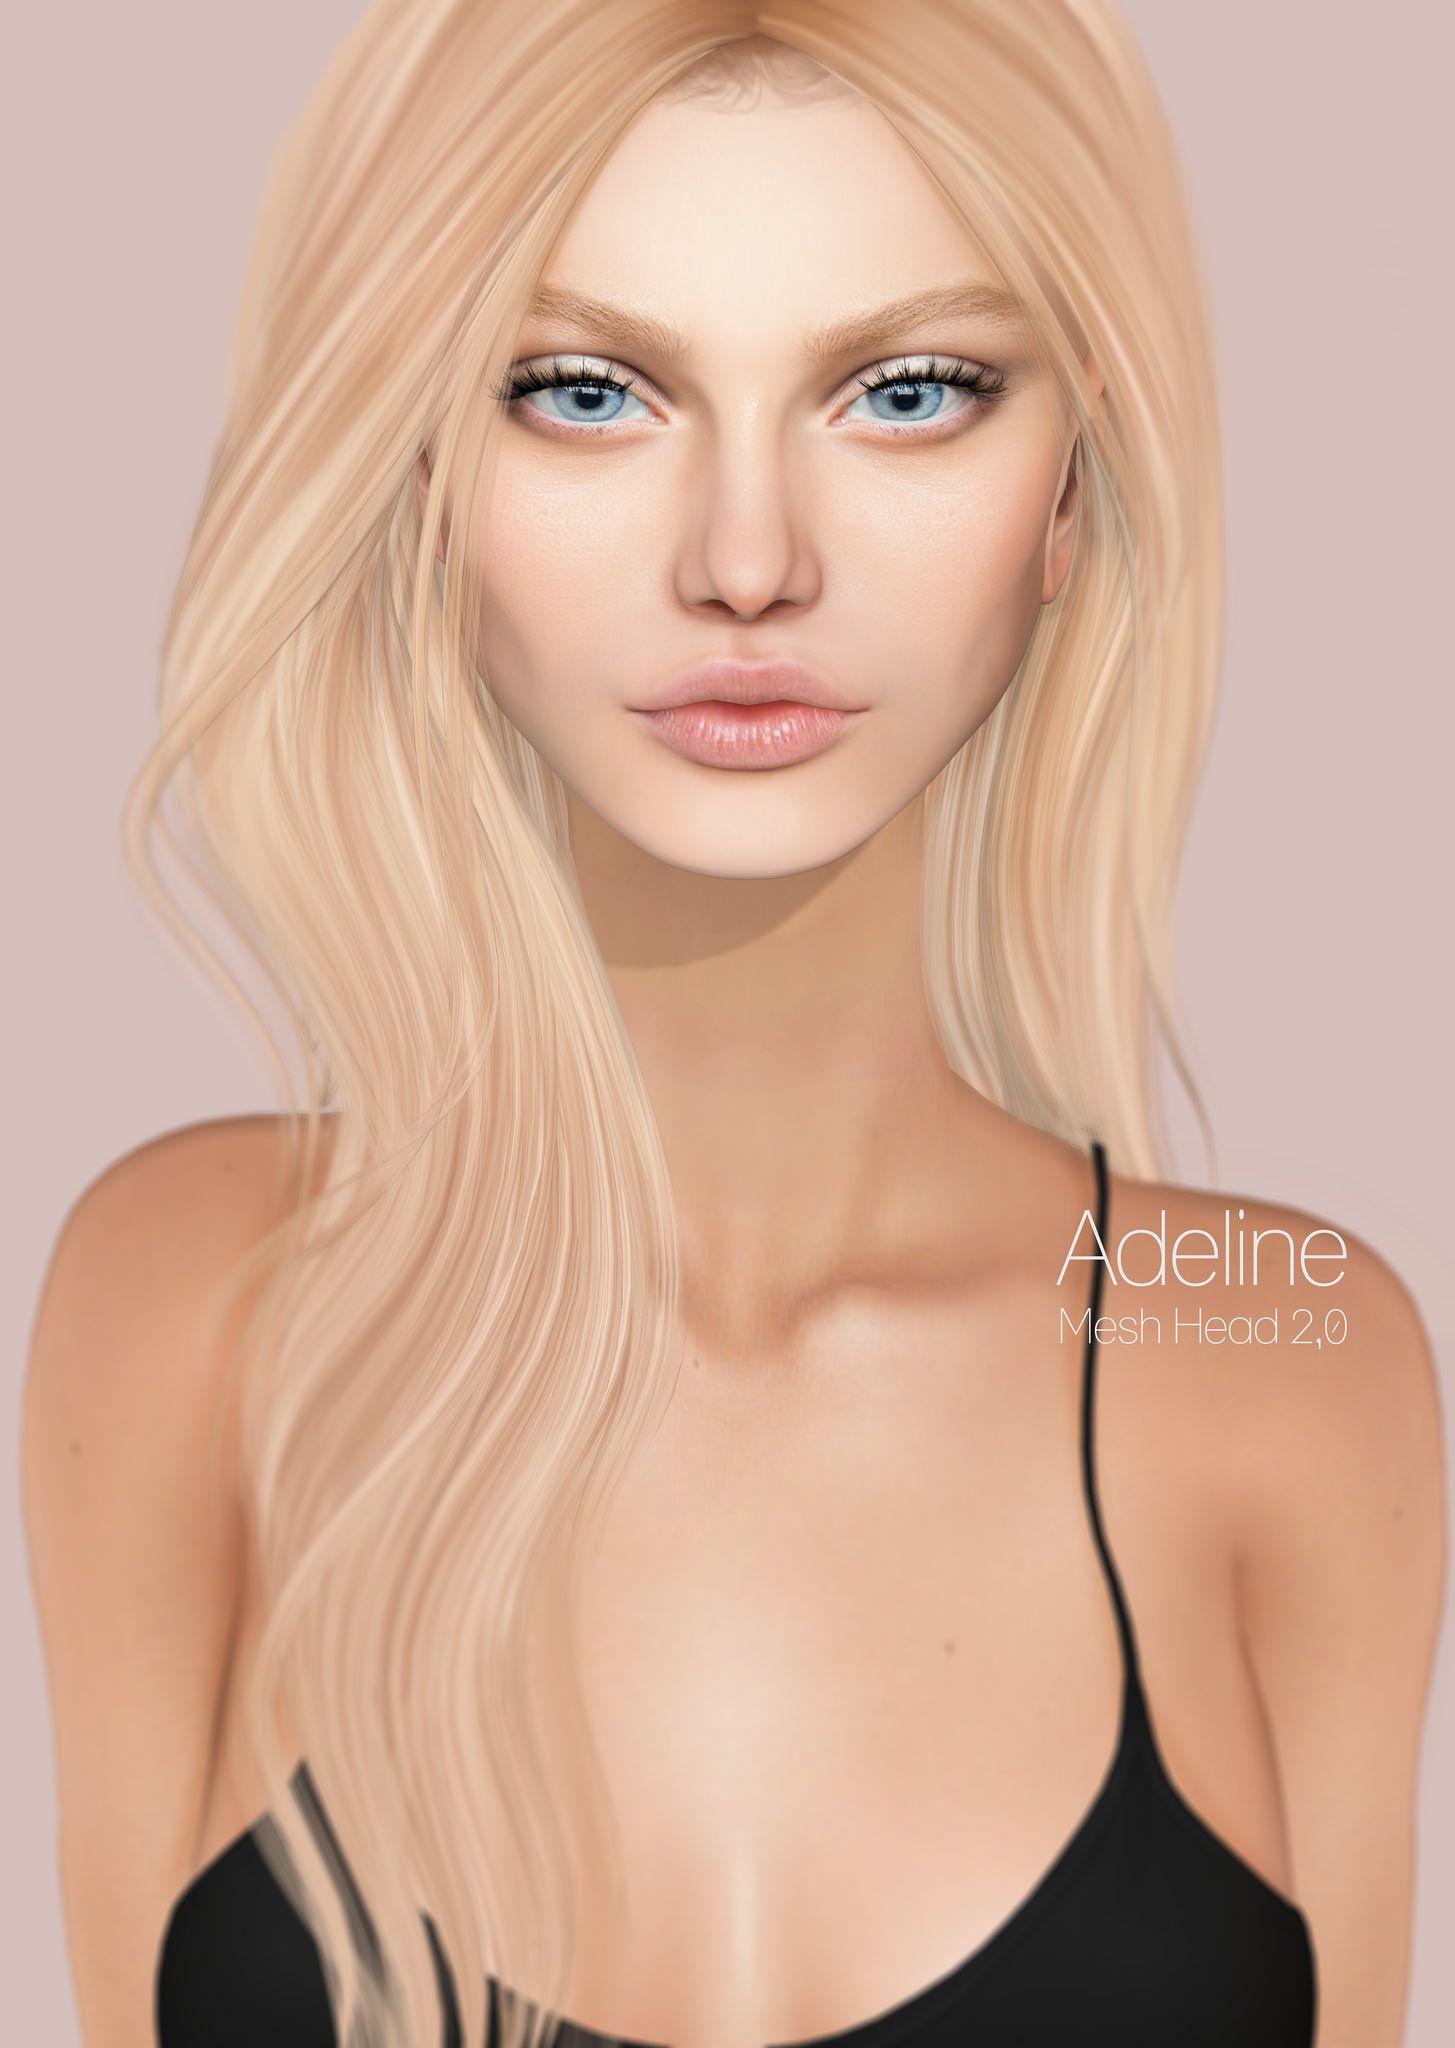 Adeline mesh head @COLLABOR88 | Beautiful Avatars | Second life